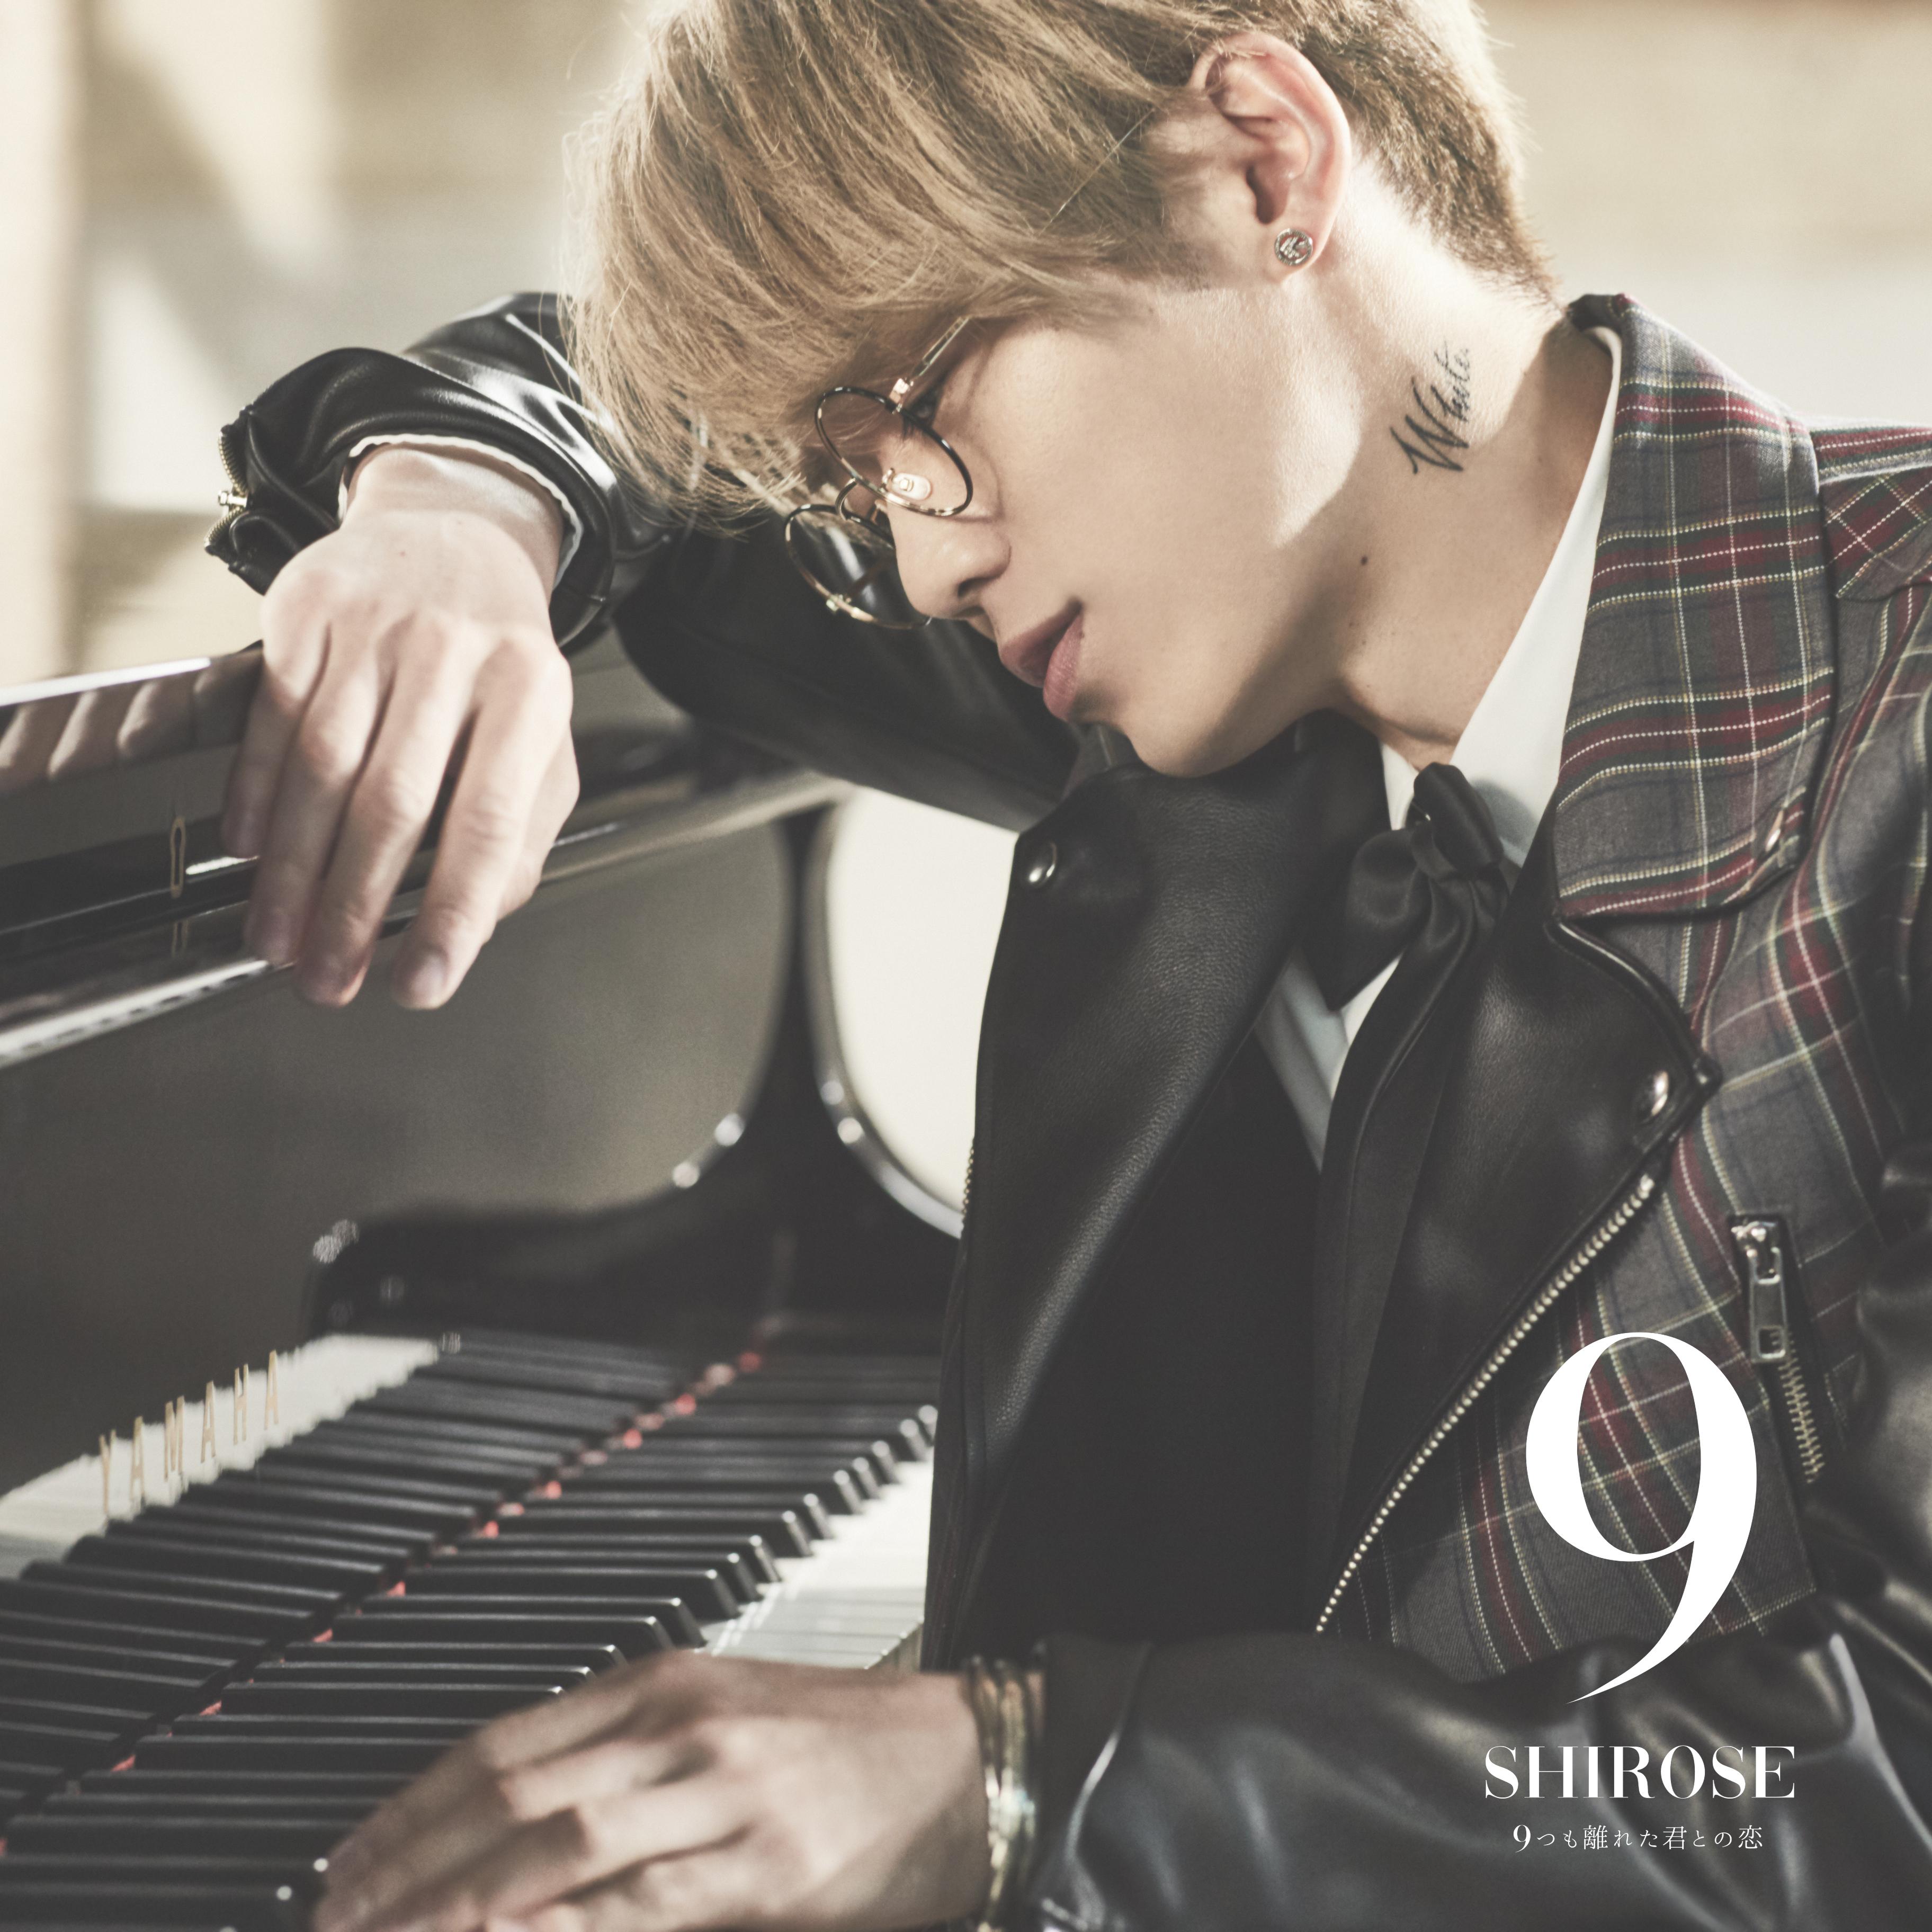 SHIROSE 1st Single「9つも離れた君との恋」